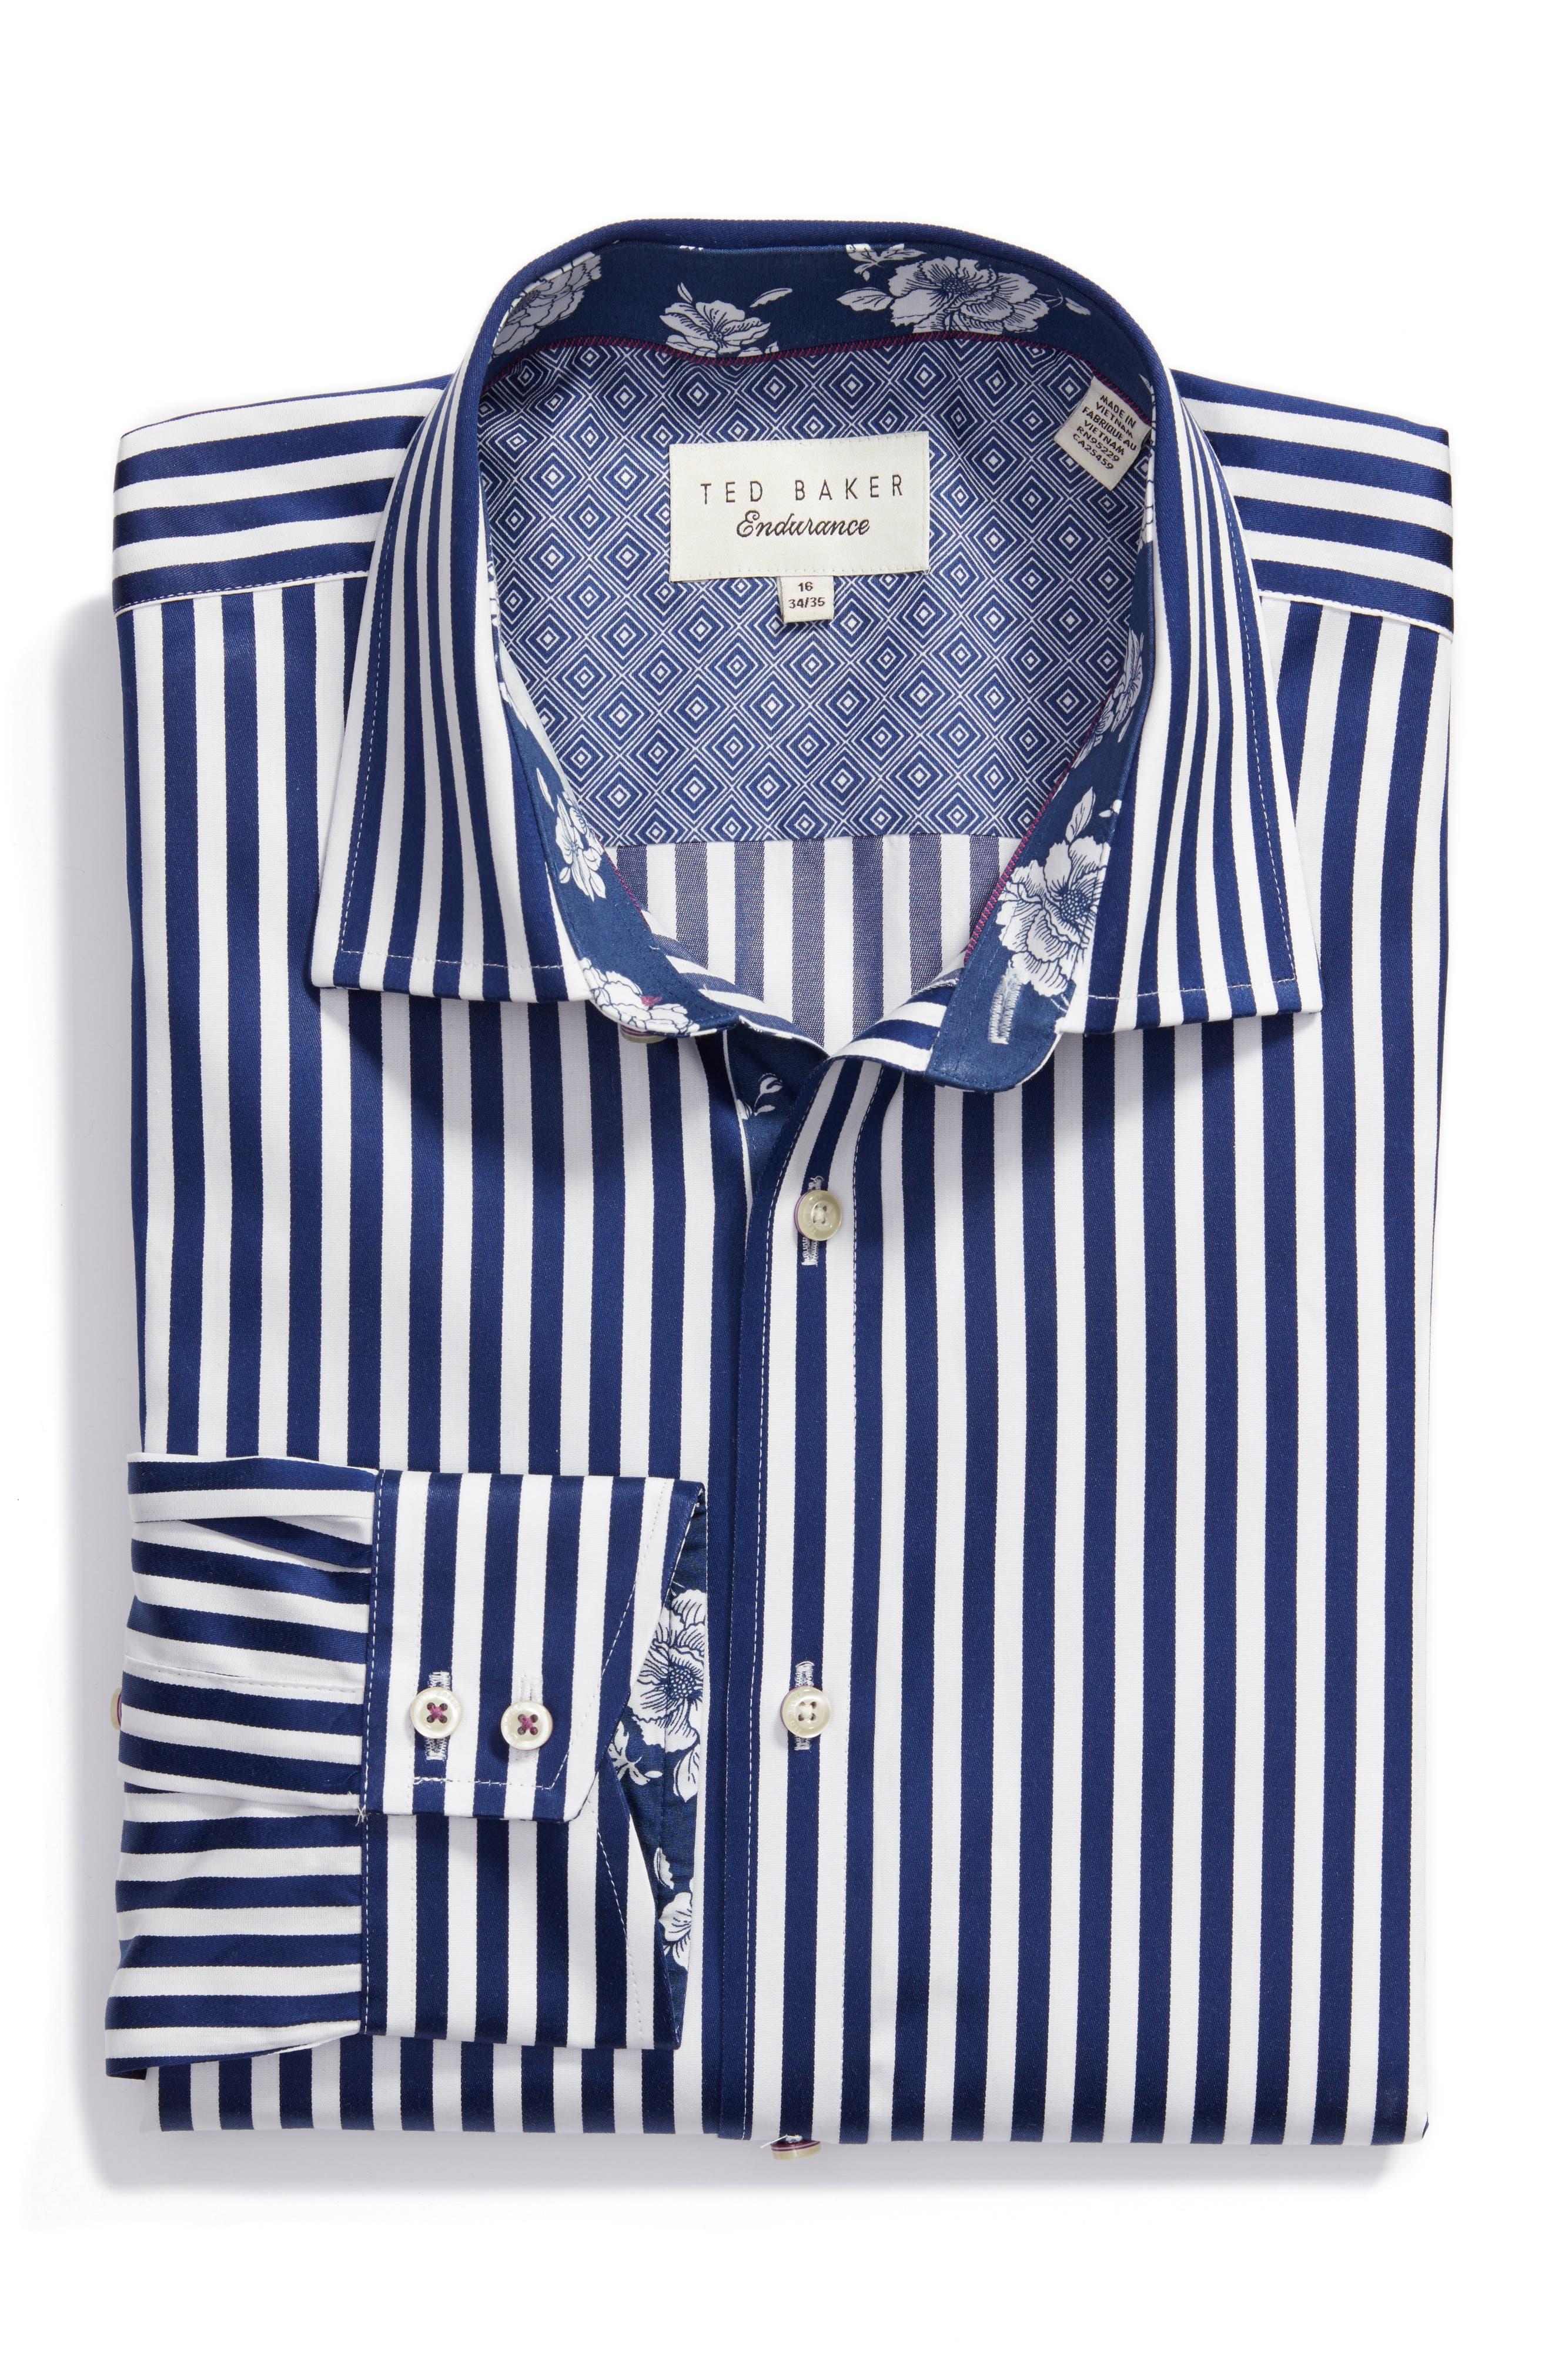 Alternate Image 1 Selected - Ted Baker London Endurance Trim Fit Dress Shirt